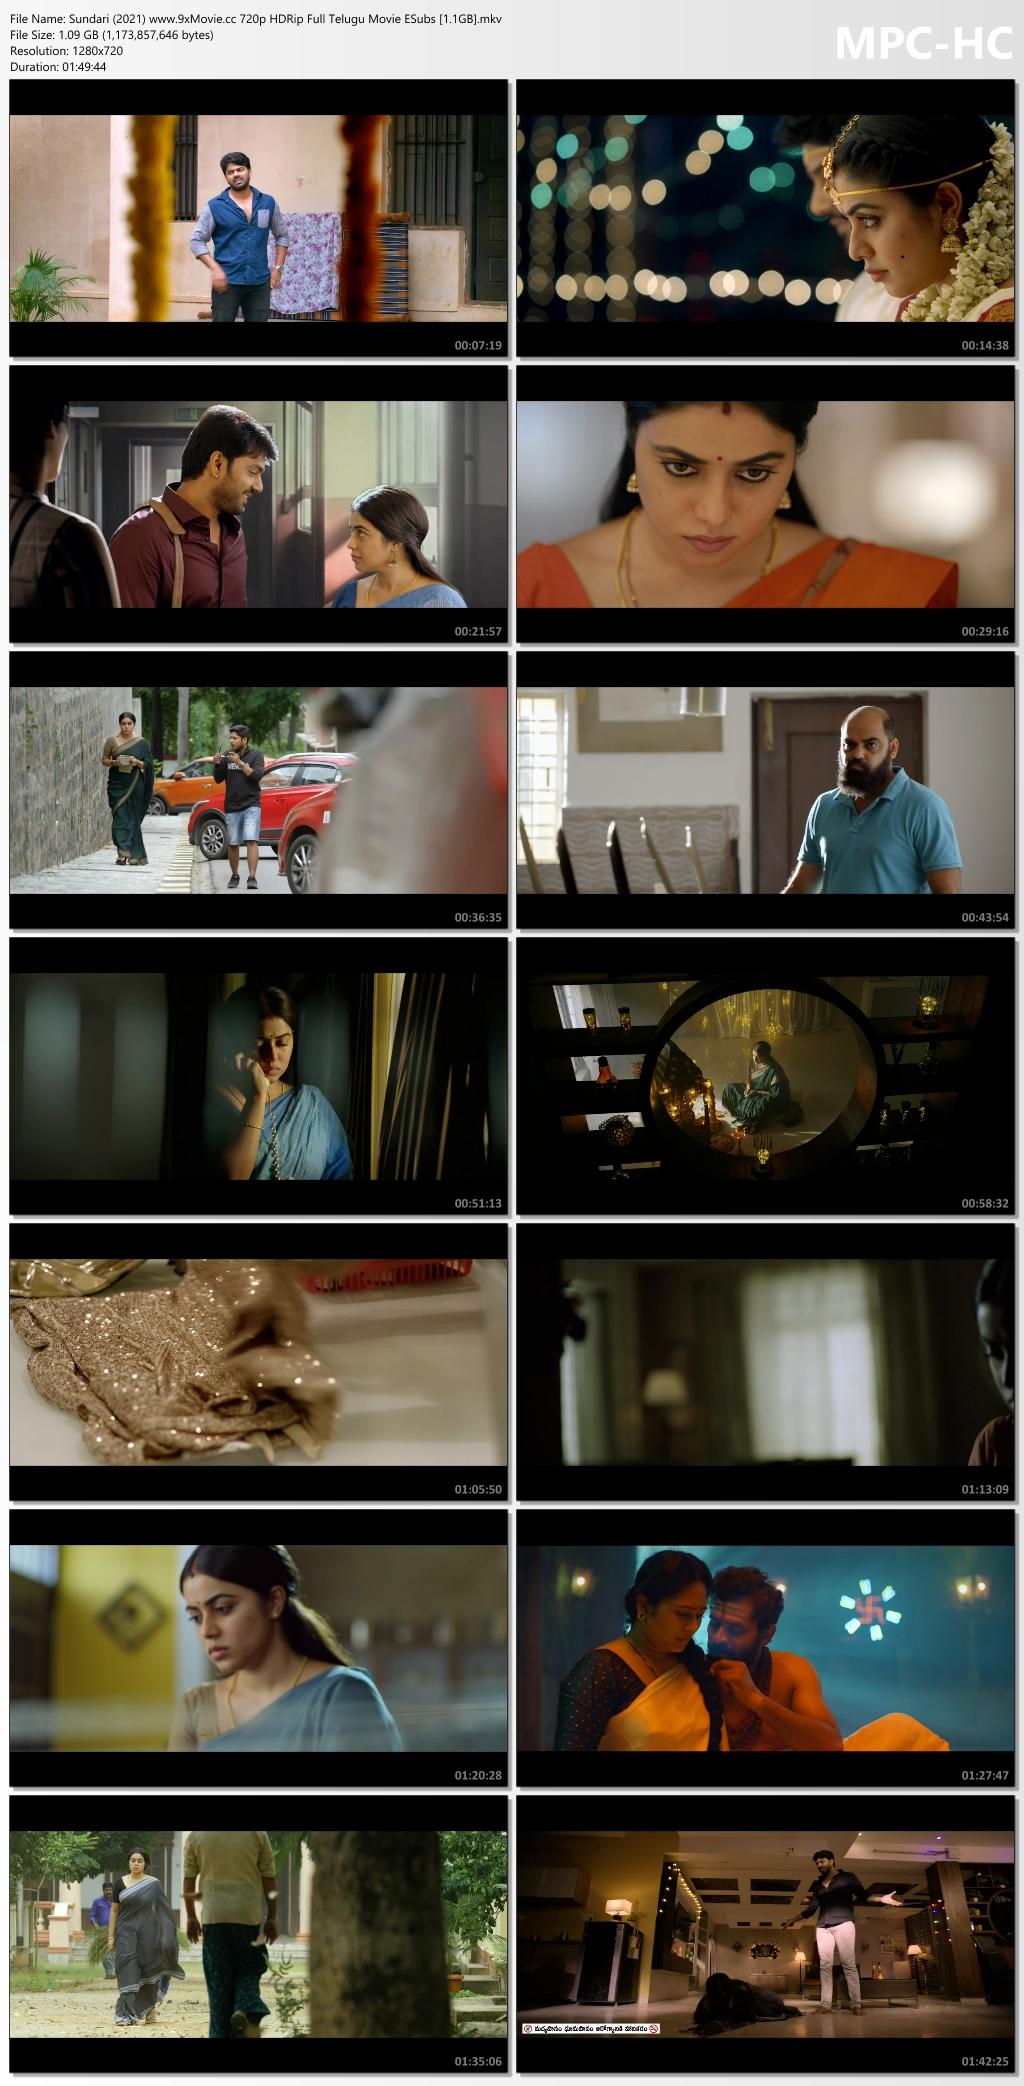 Sundari-2021-www-9x-Movie-cc-720p-HDRip-Full-Telugu-Movie-ESubs-1-1-GB-mkv